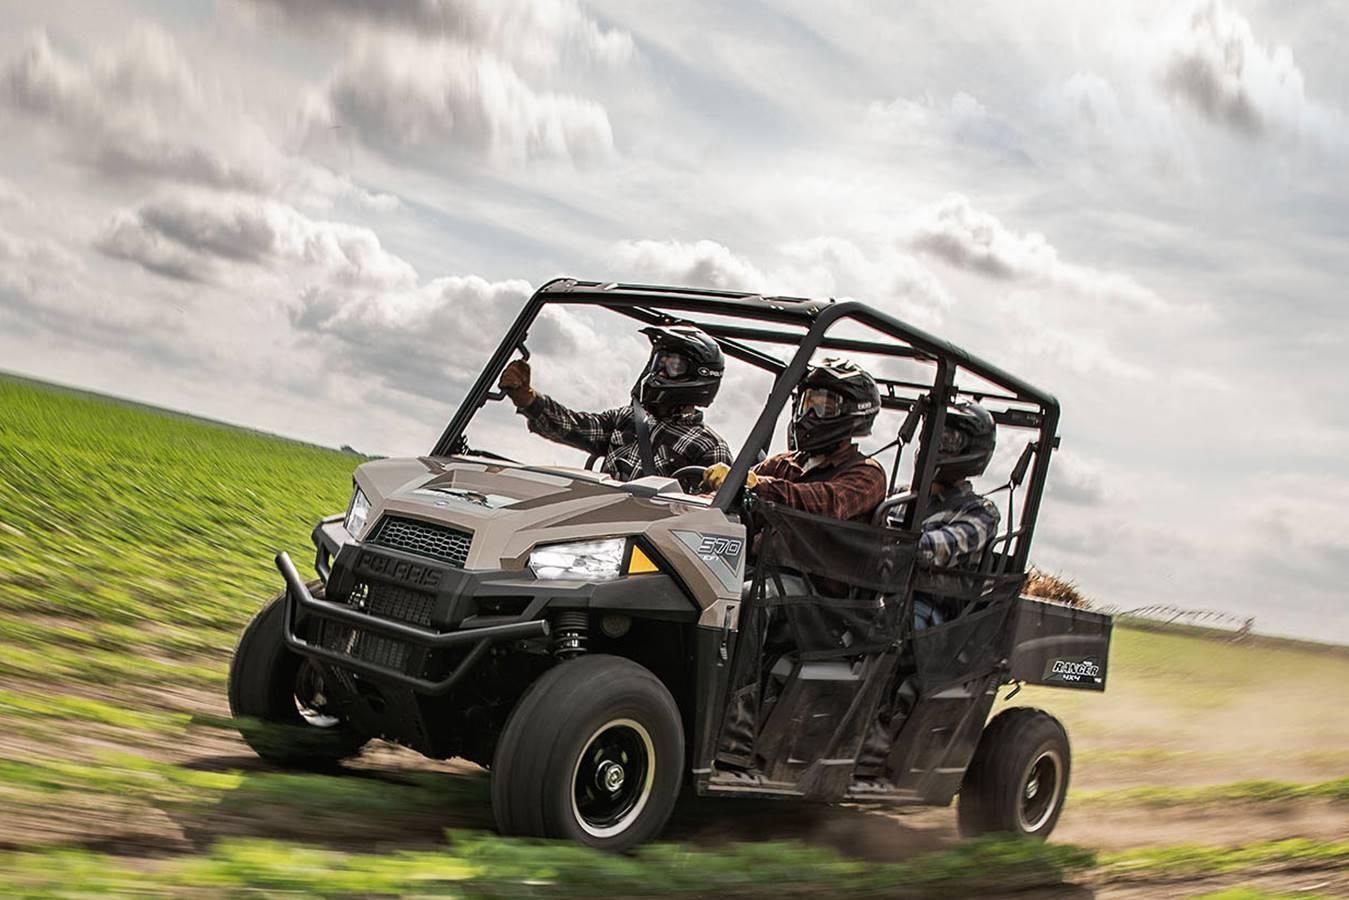 2019 Polaris Ranger Crew 570-4 for sale 3991